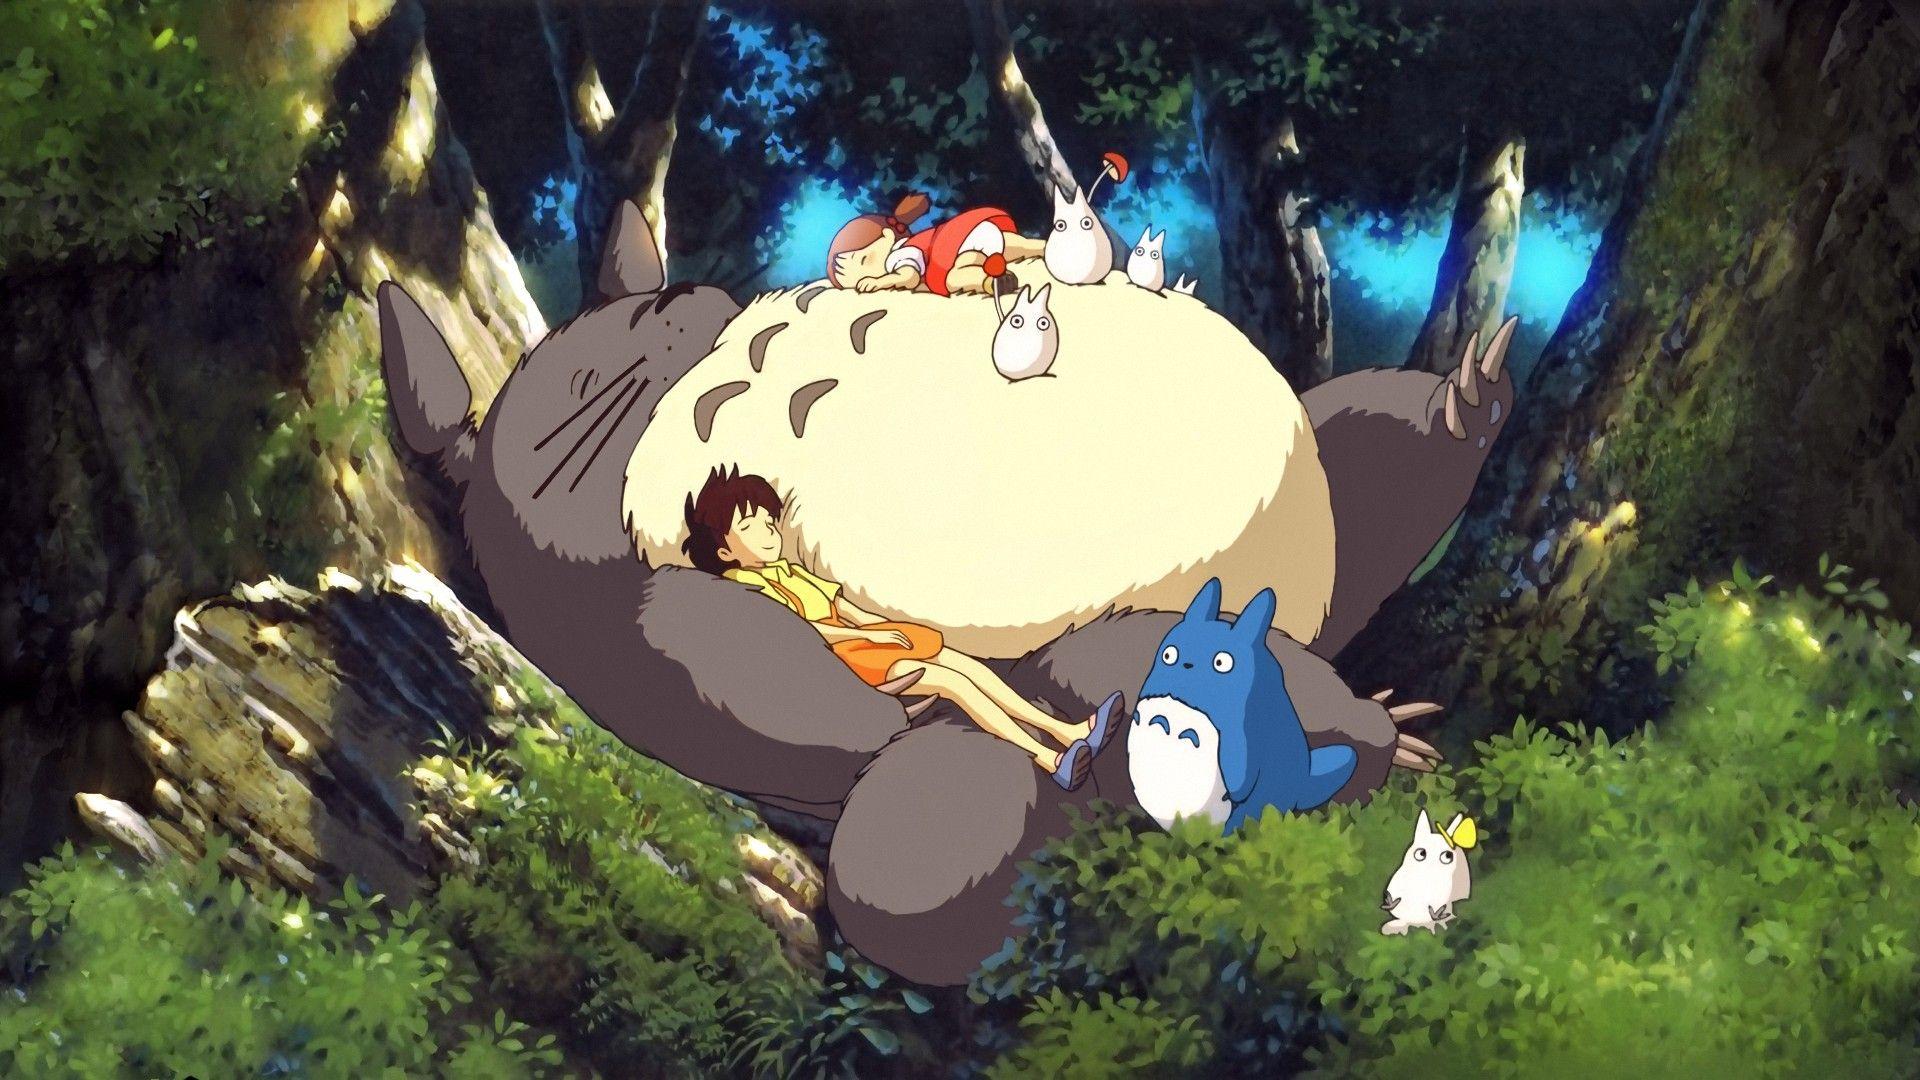 Totoro Studio Ghibli My Neighbor Totoro Anime Wallpaper 画像あり トトロ 宮崎駿 スタジオジブリ